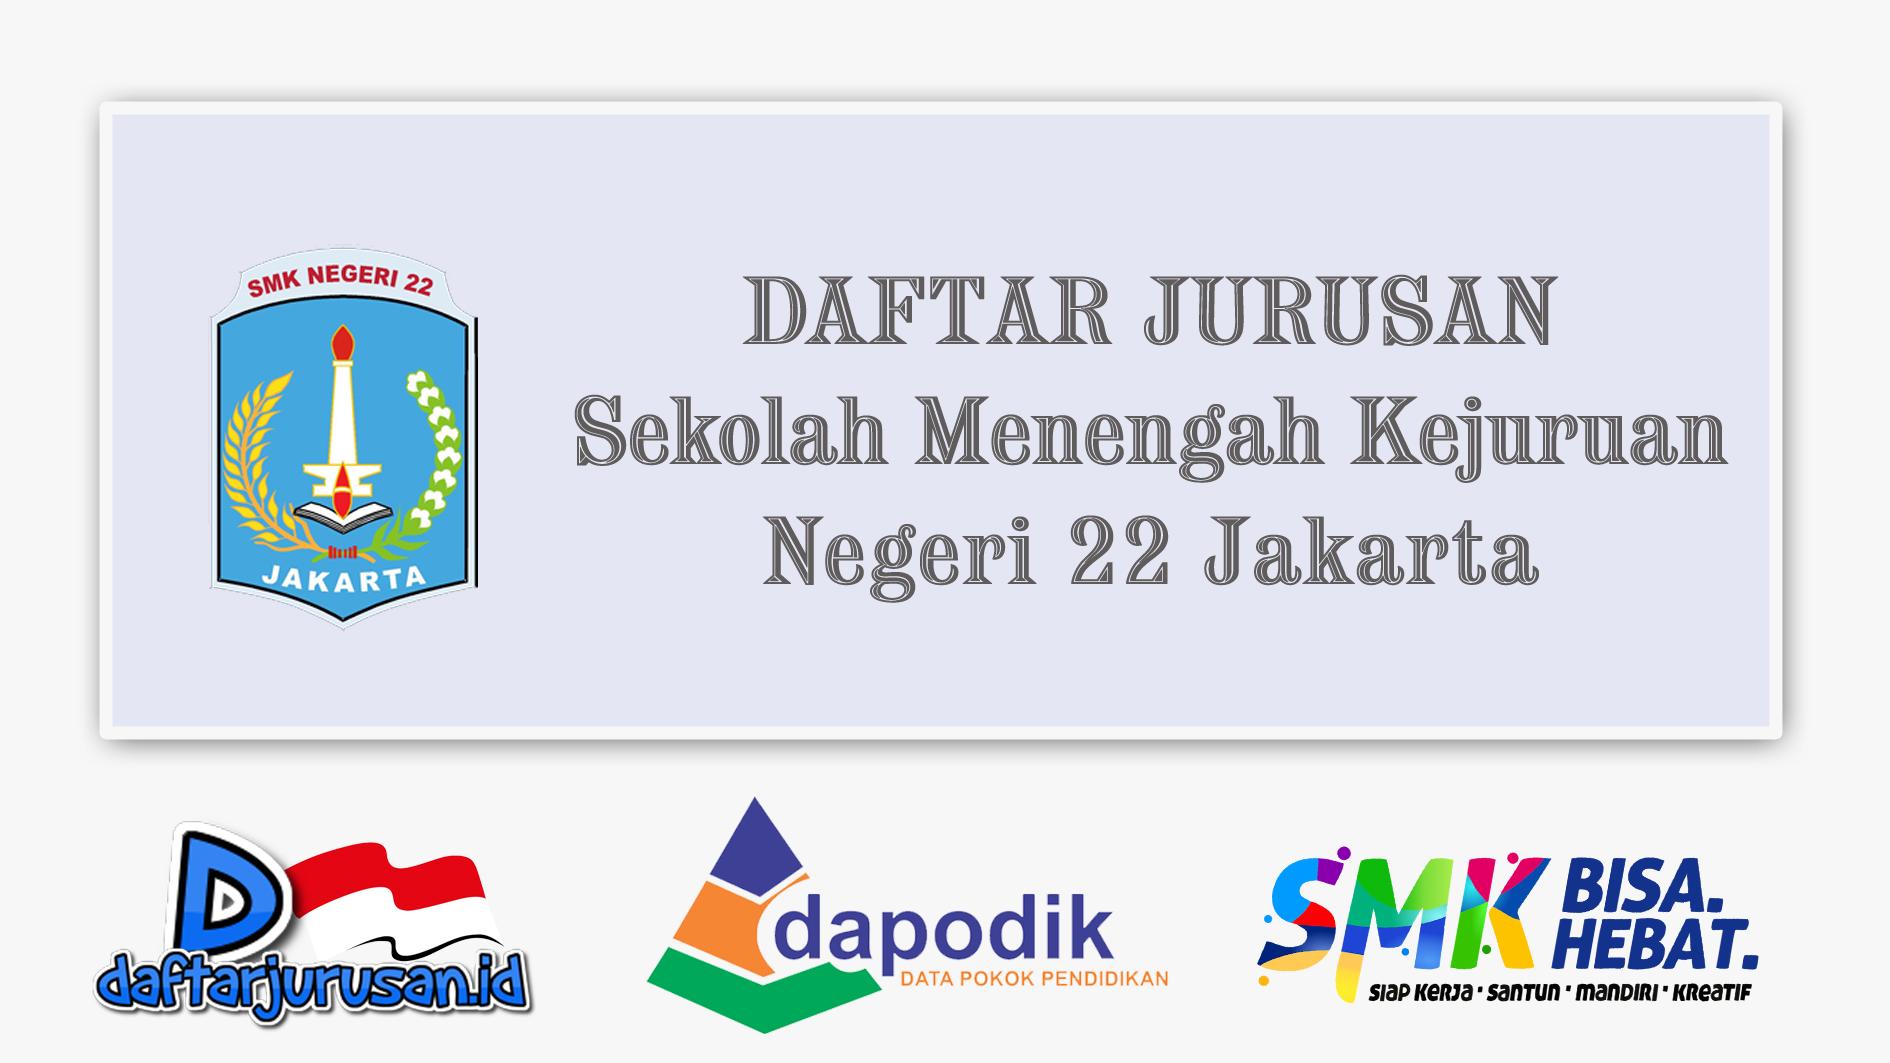 Daftar Jurusan SMK Negeri 22 Jakarta Timur